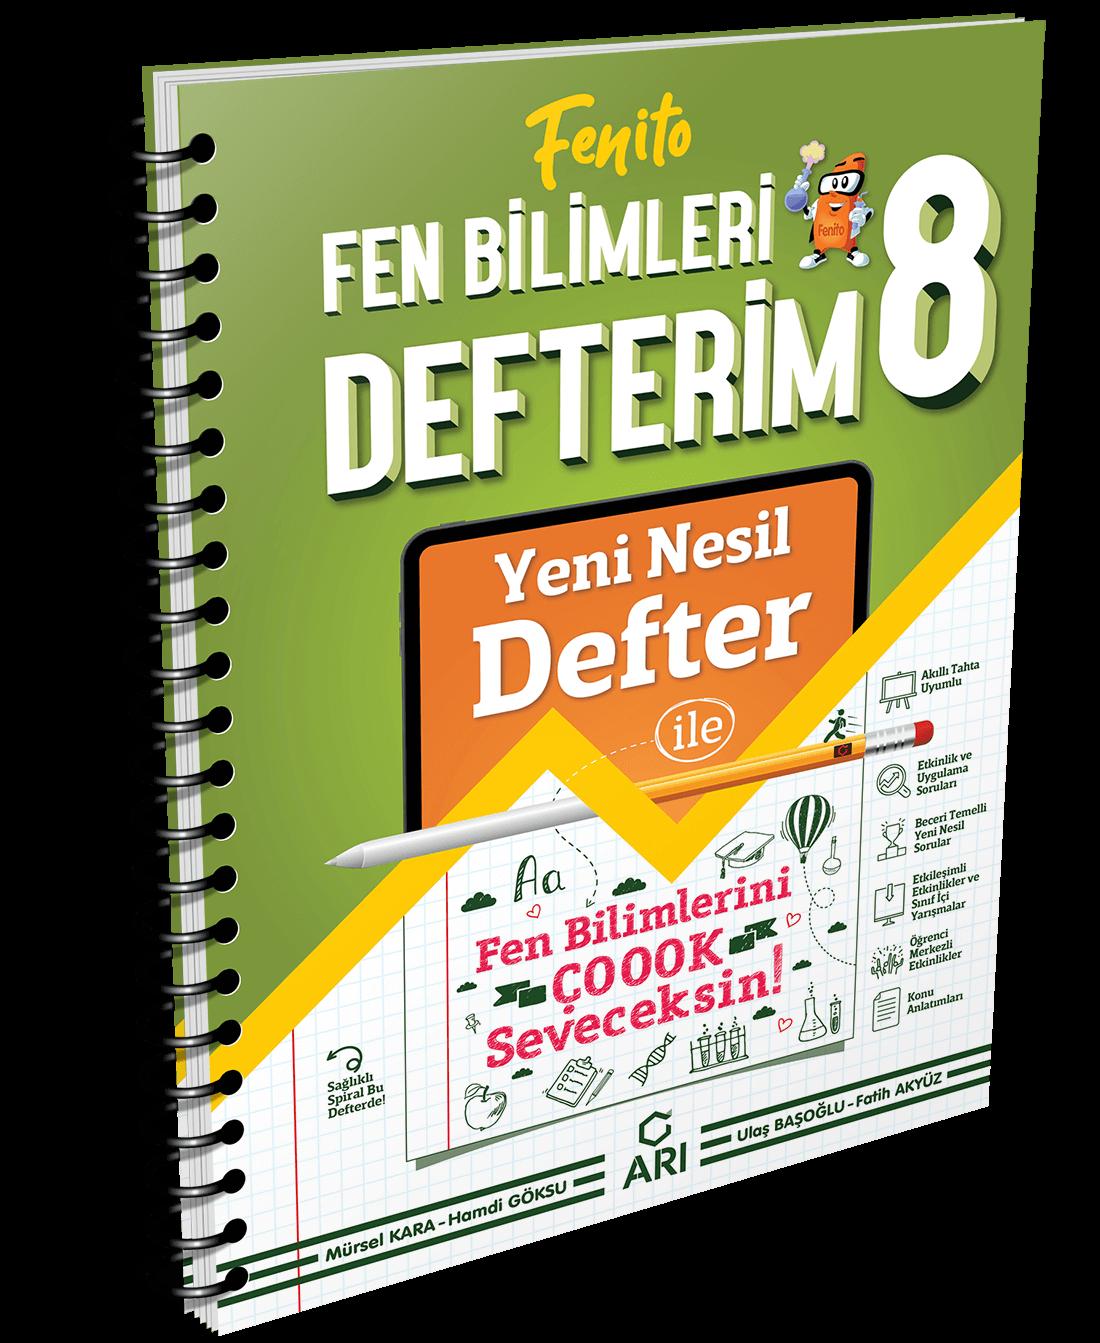 Fenito Fen Bilimleri Defterim 8. Sınıf